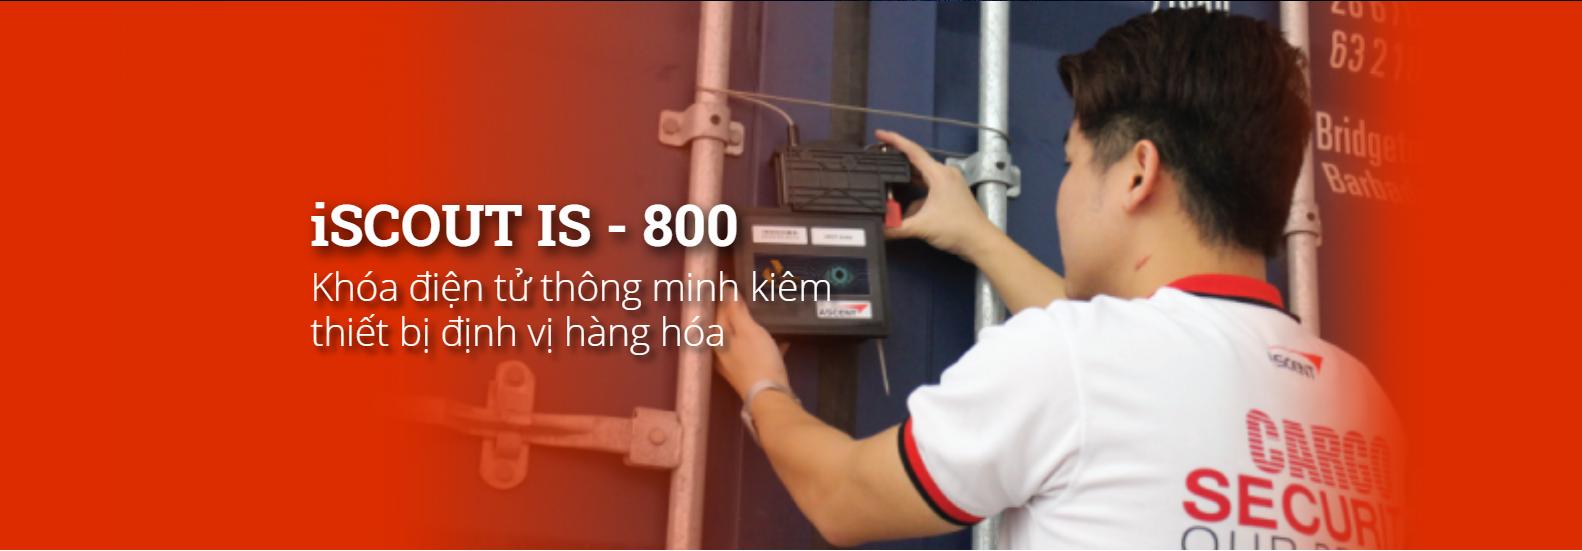 khoa-thong-minh-IoT-iSCOUT-IS-́800-baokhangcorp